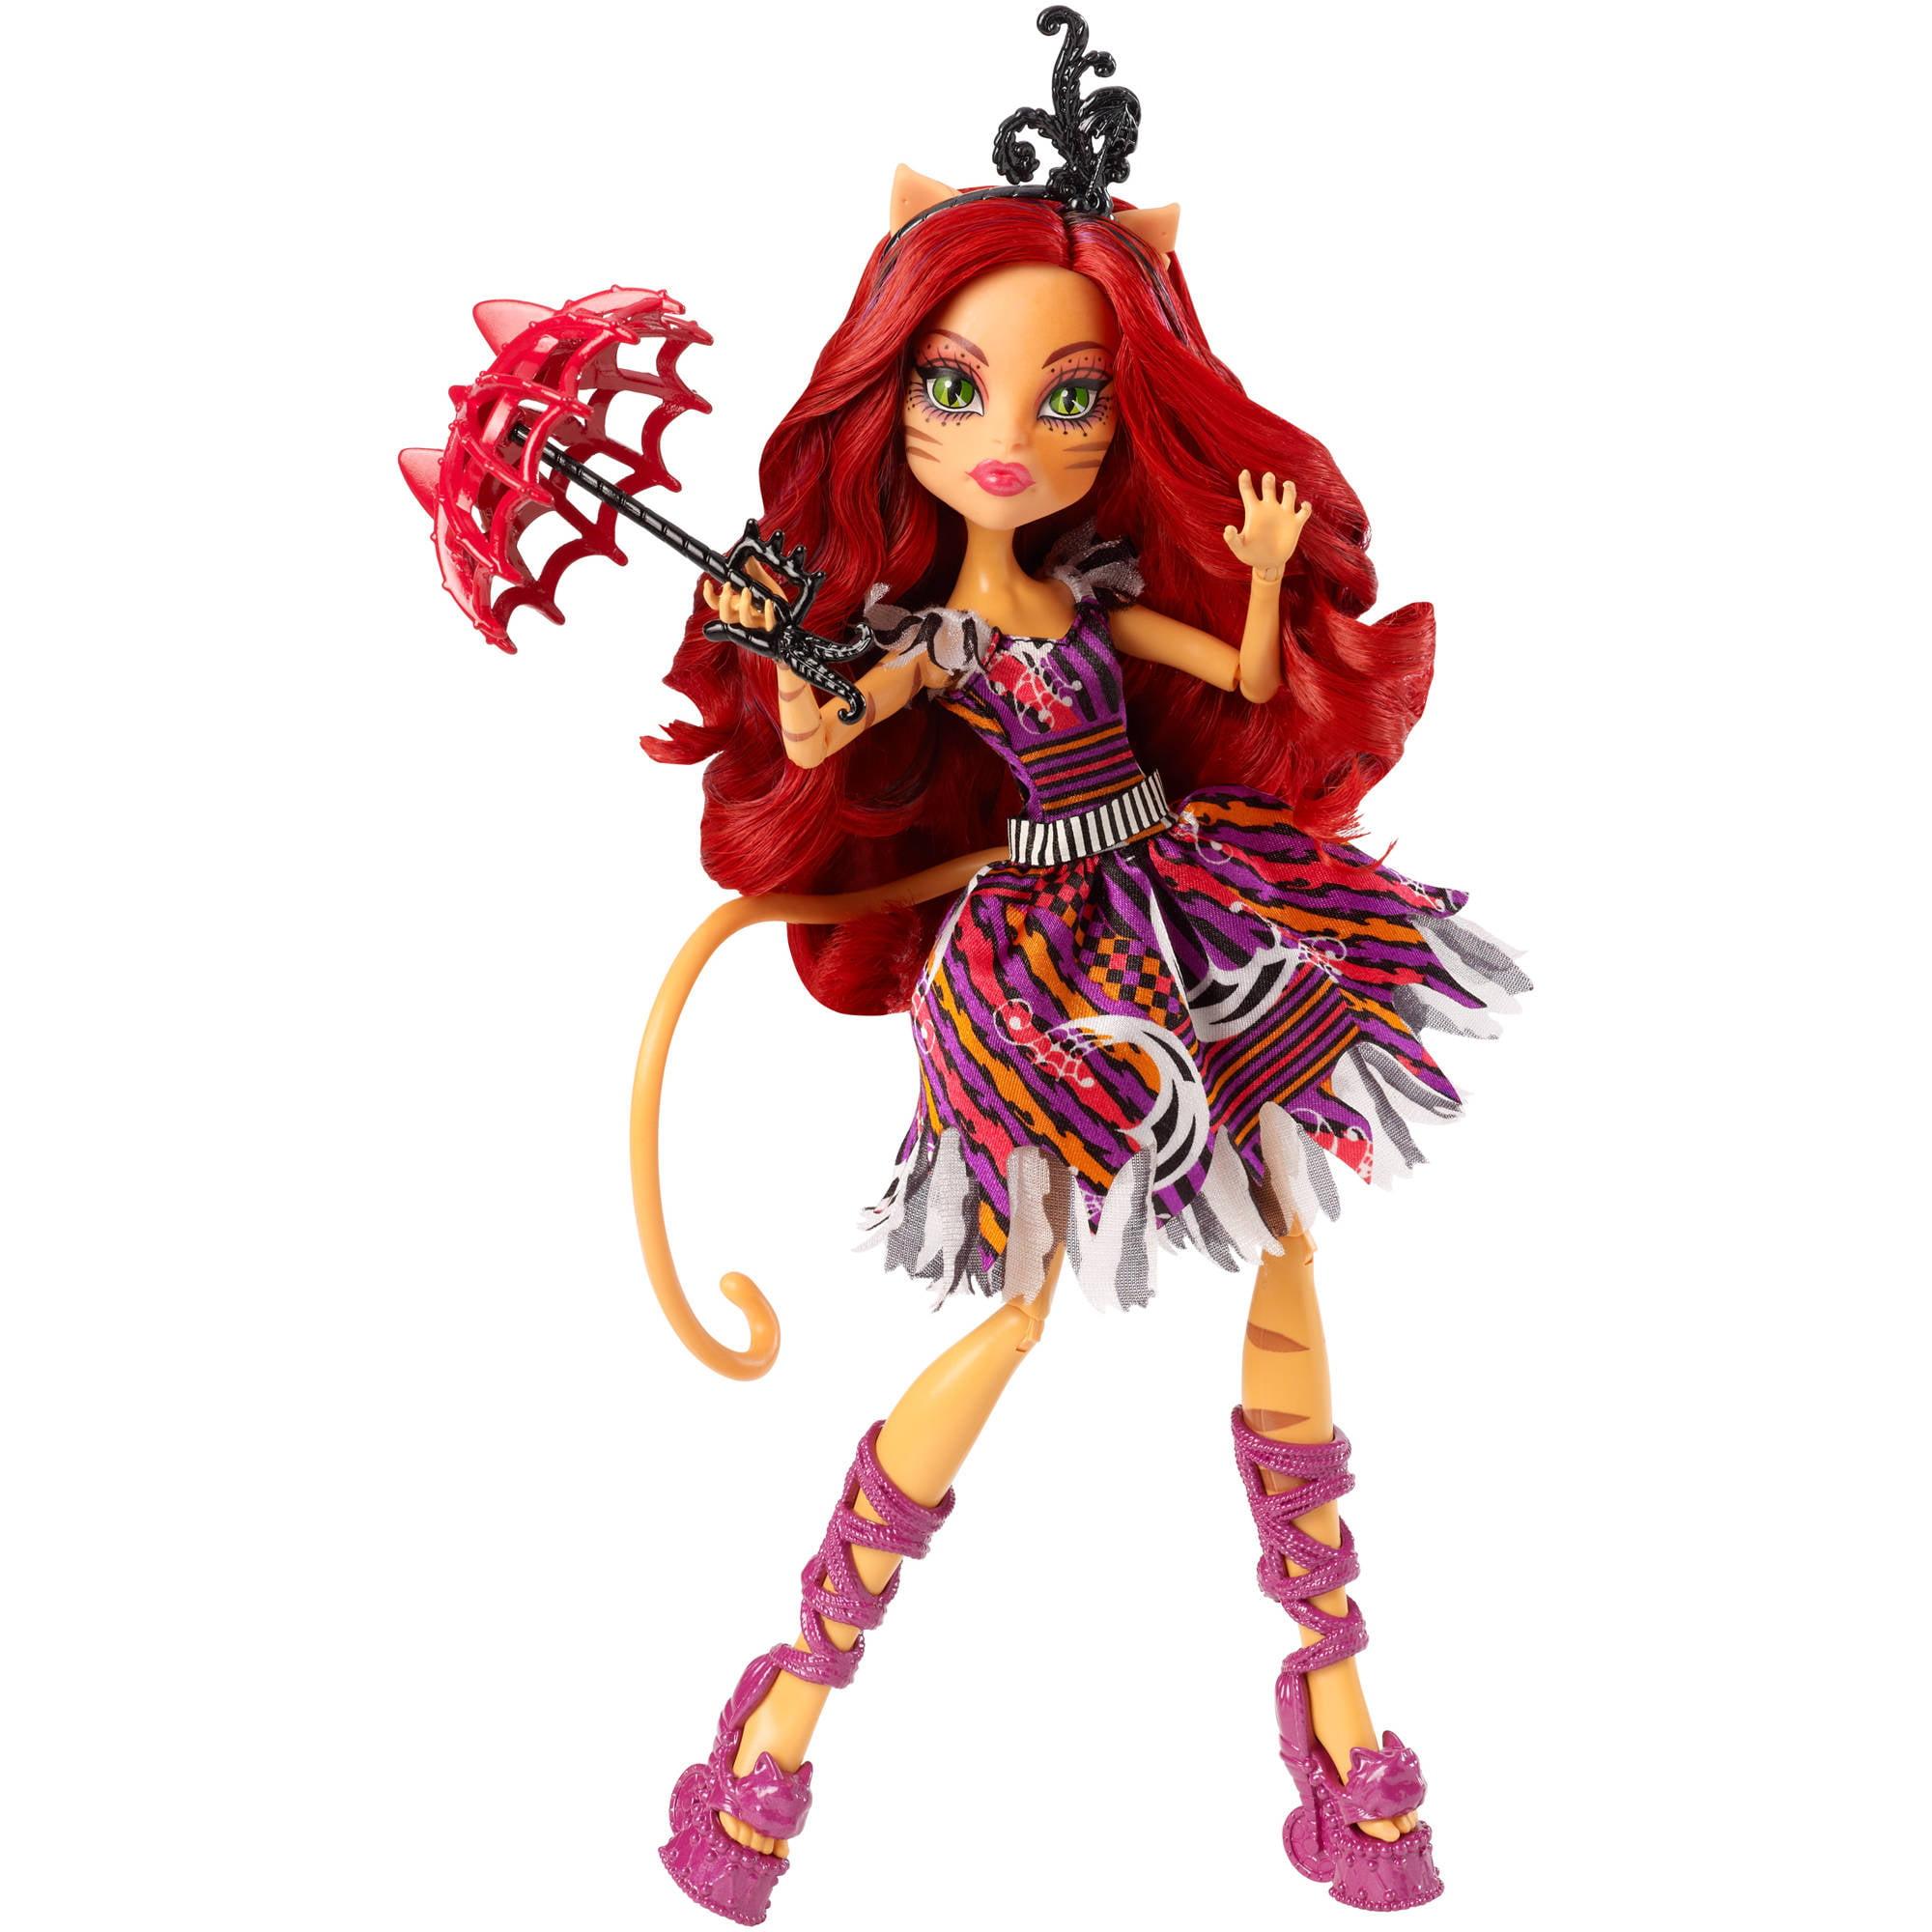 Monster High Freak du Chic Toralei Doll by Mattel